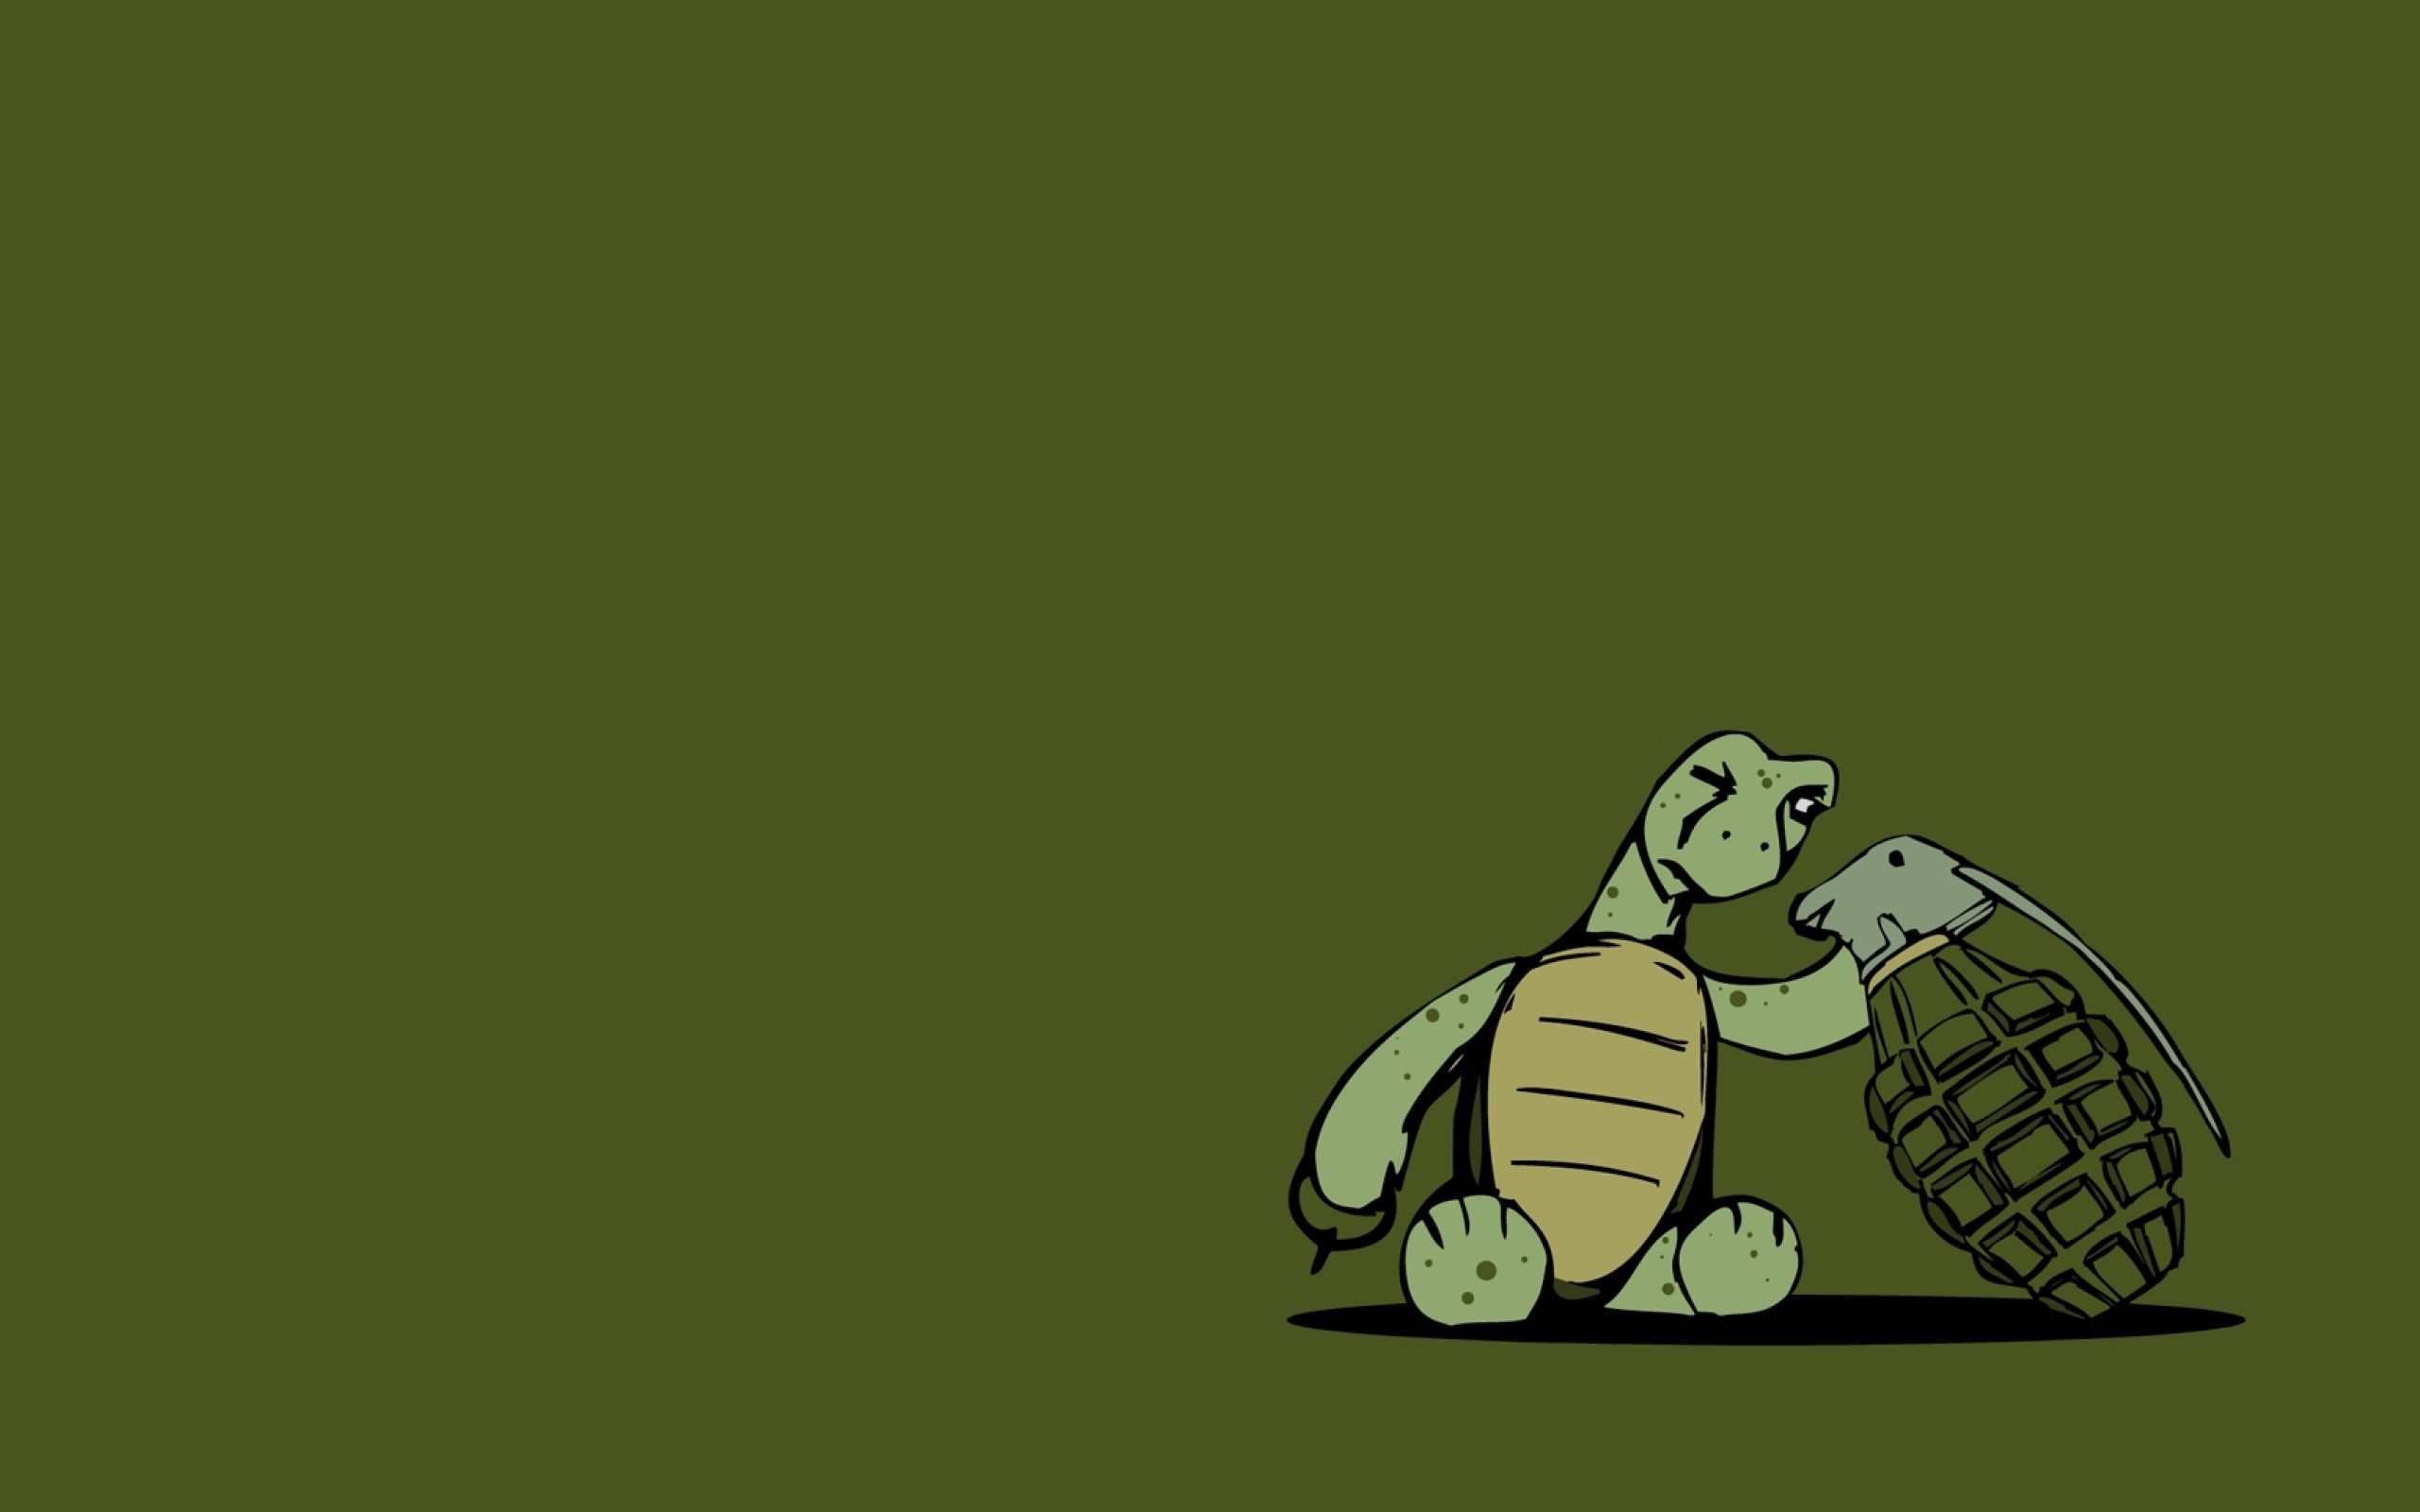 Turtle Grenade Art Funny